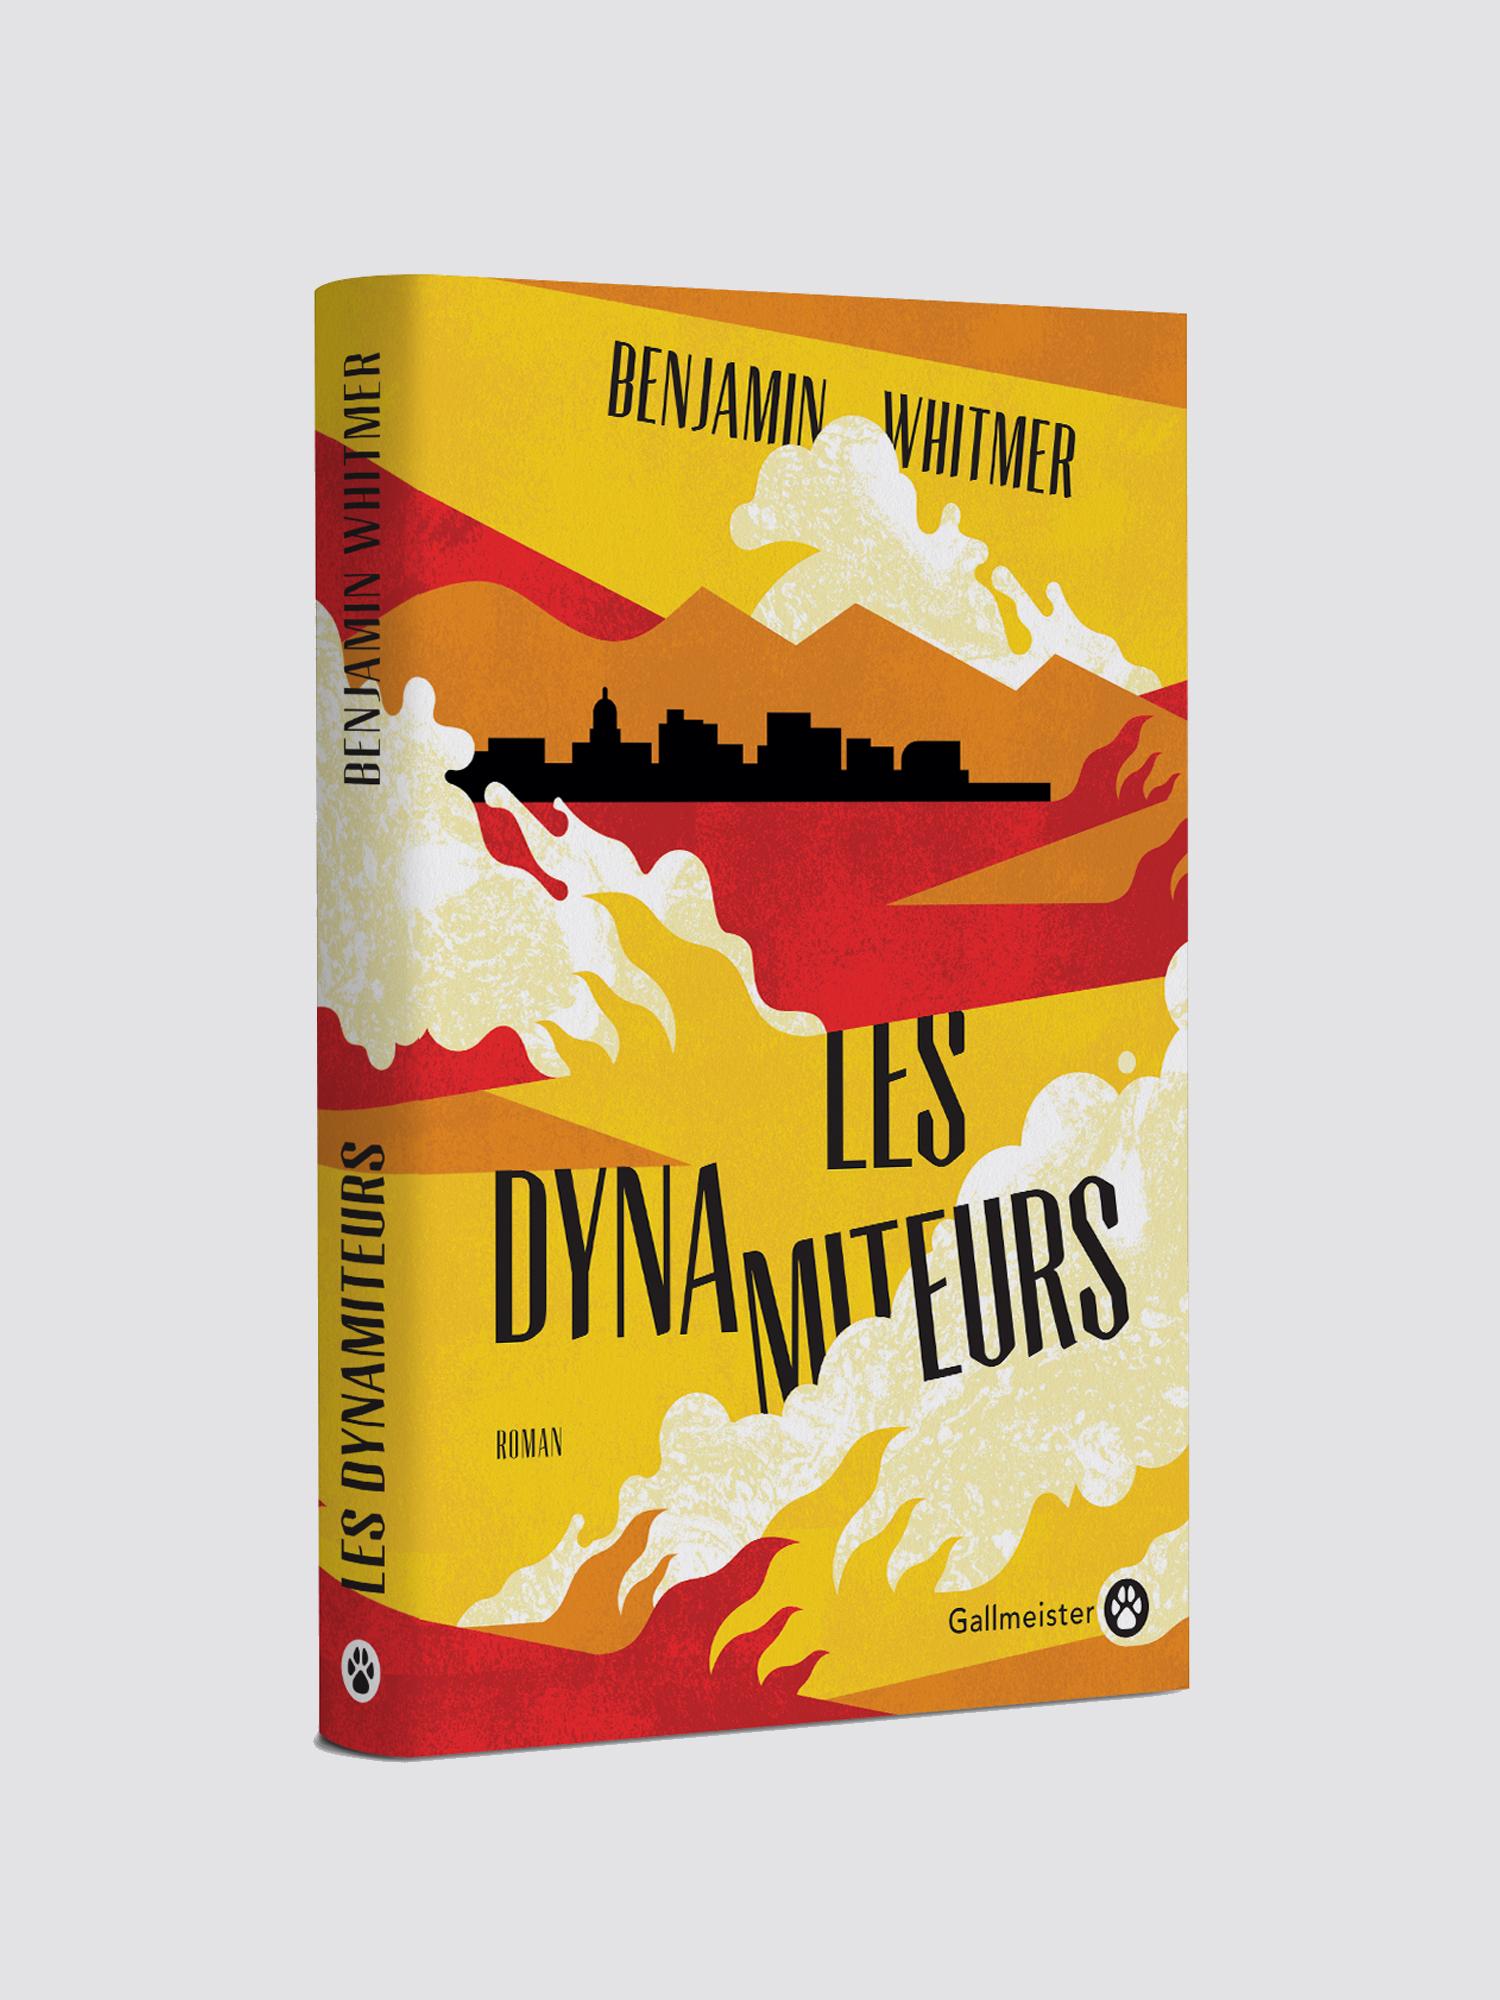 Les dynamiteurs,gallmeister,aurelie bert,benjamin whitmer,edition